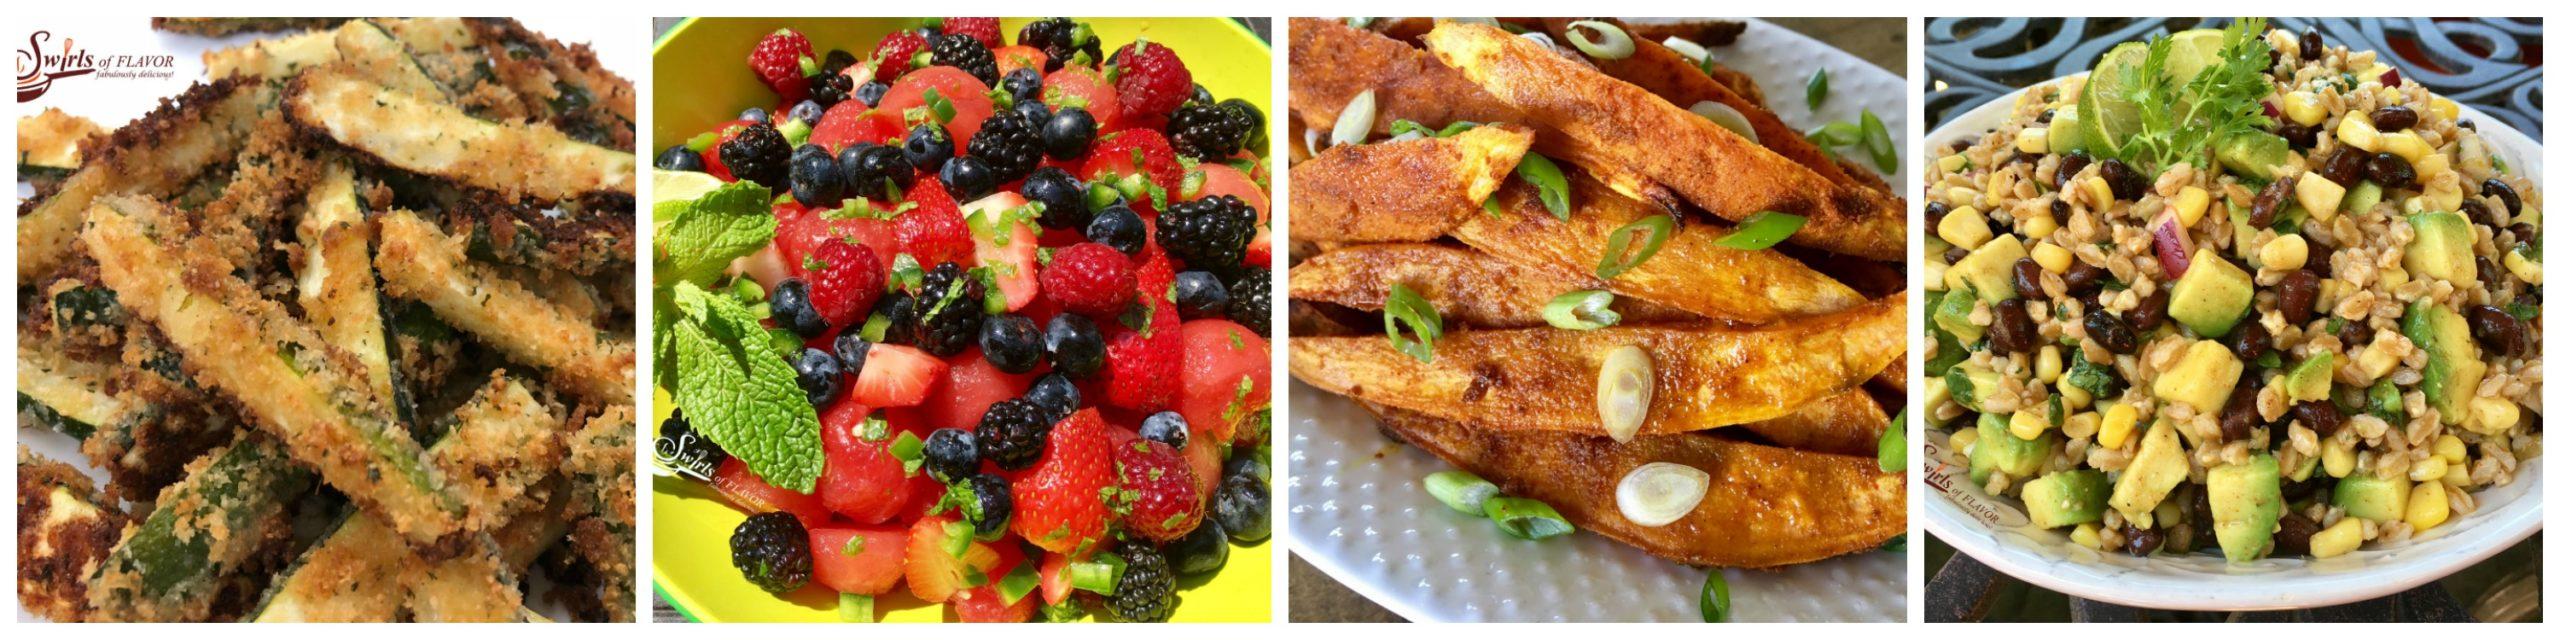 Zucchini Fries, Fruit Salad, Sweet Potato Fries and Farro Salad